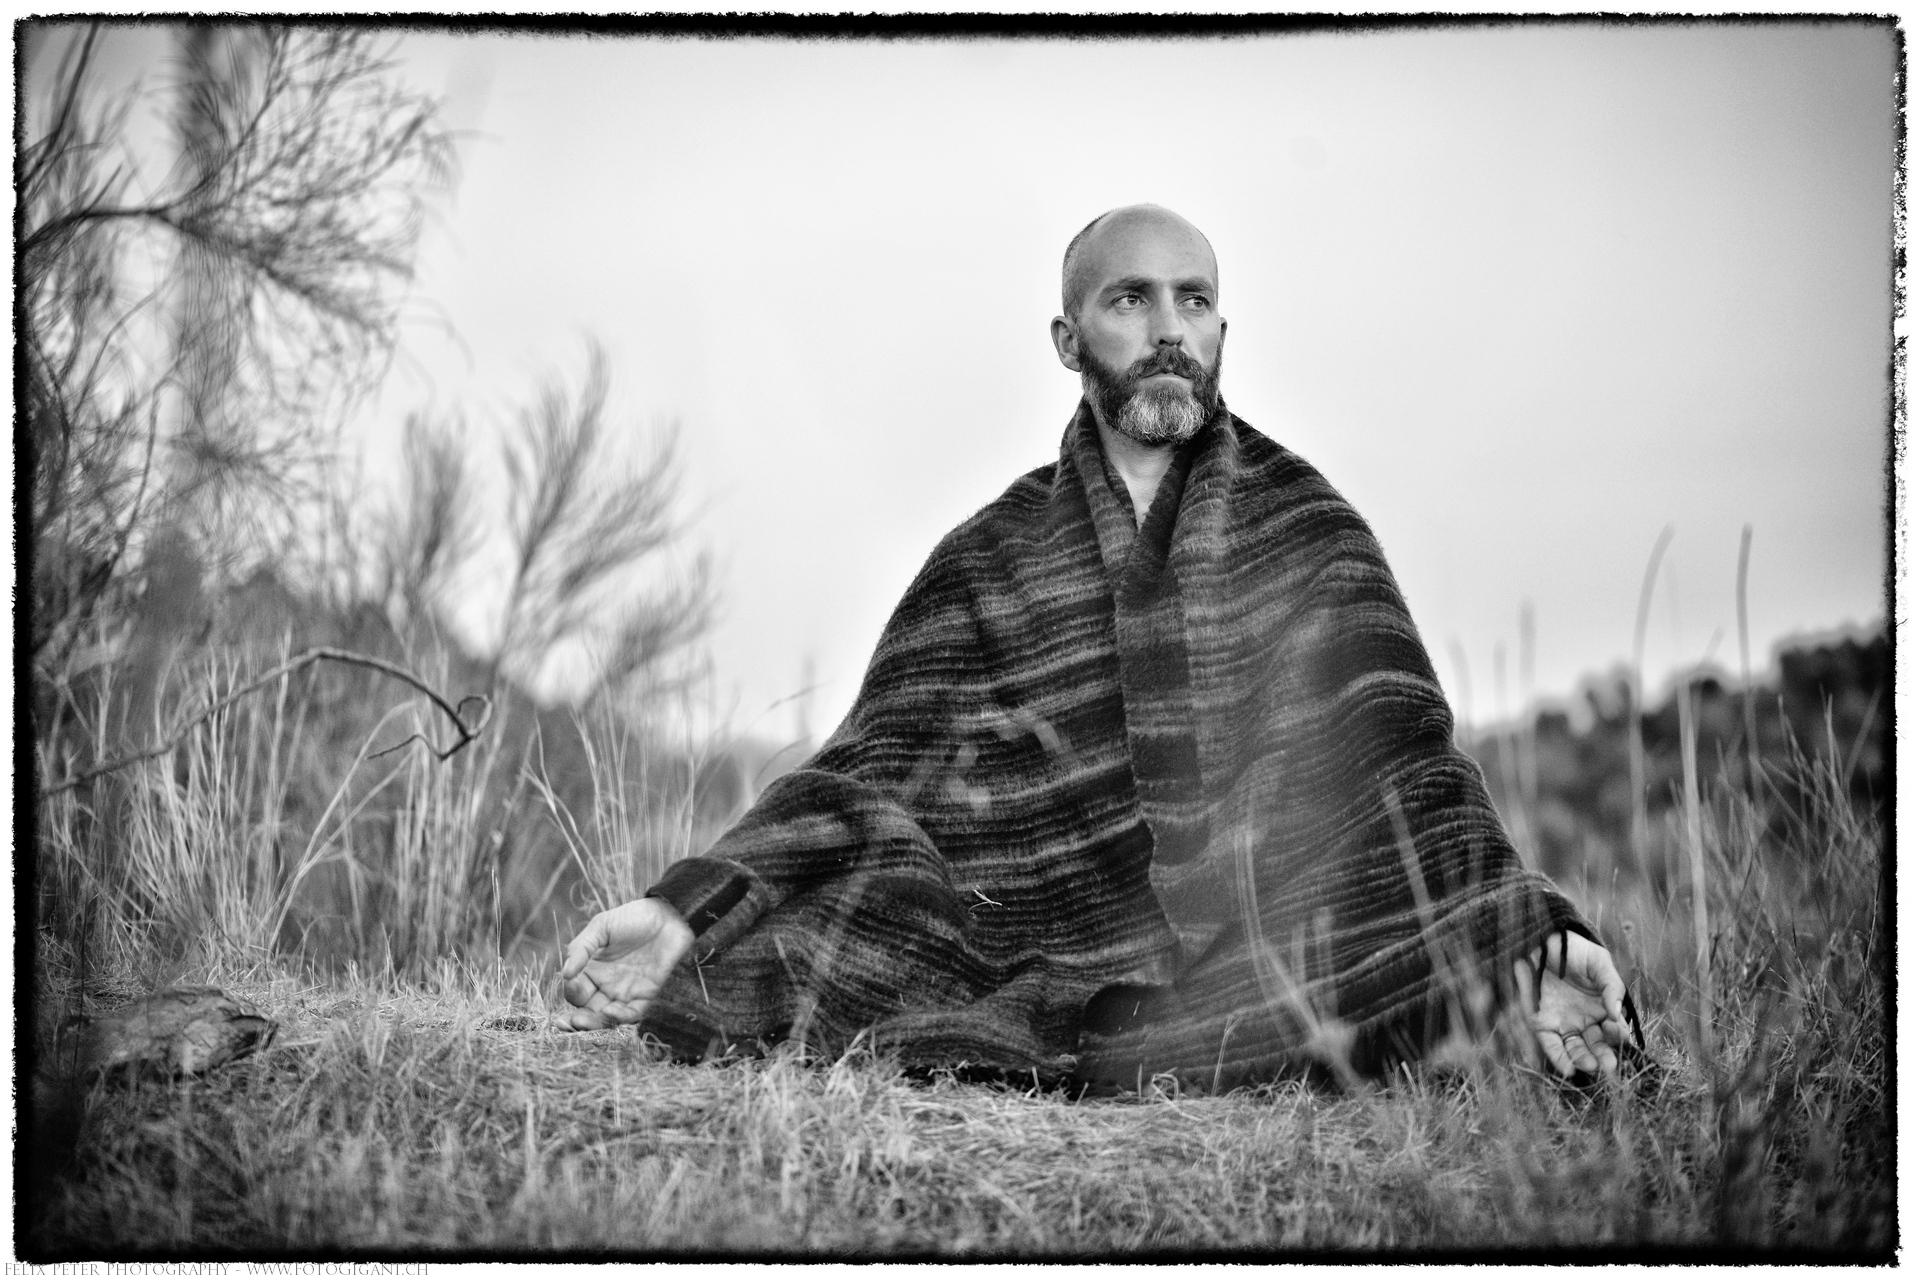 Felix-Peter-Yoga-Pilates-Dance-Fotografie_Bern_100.jpg